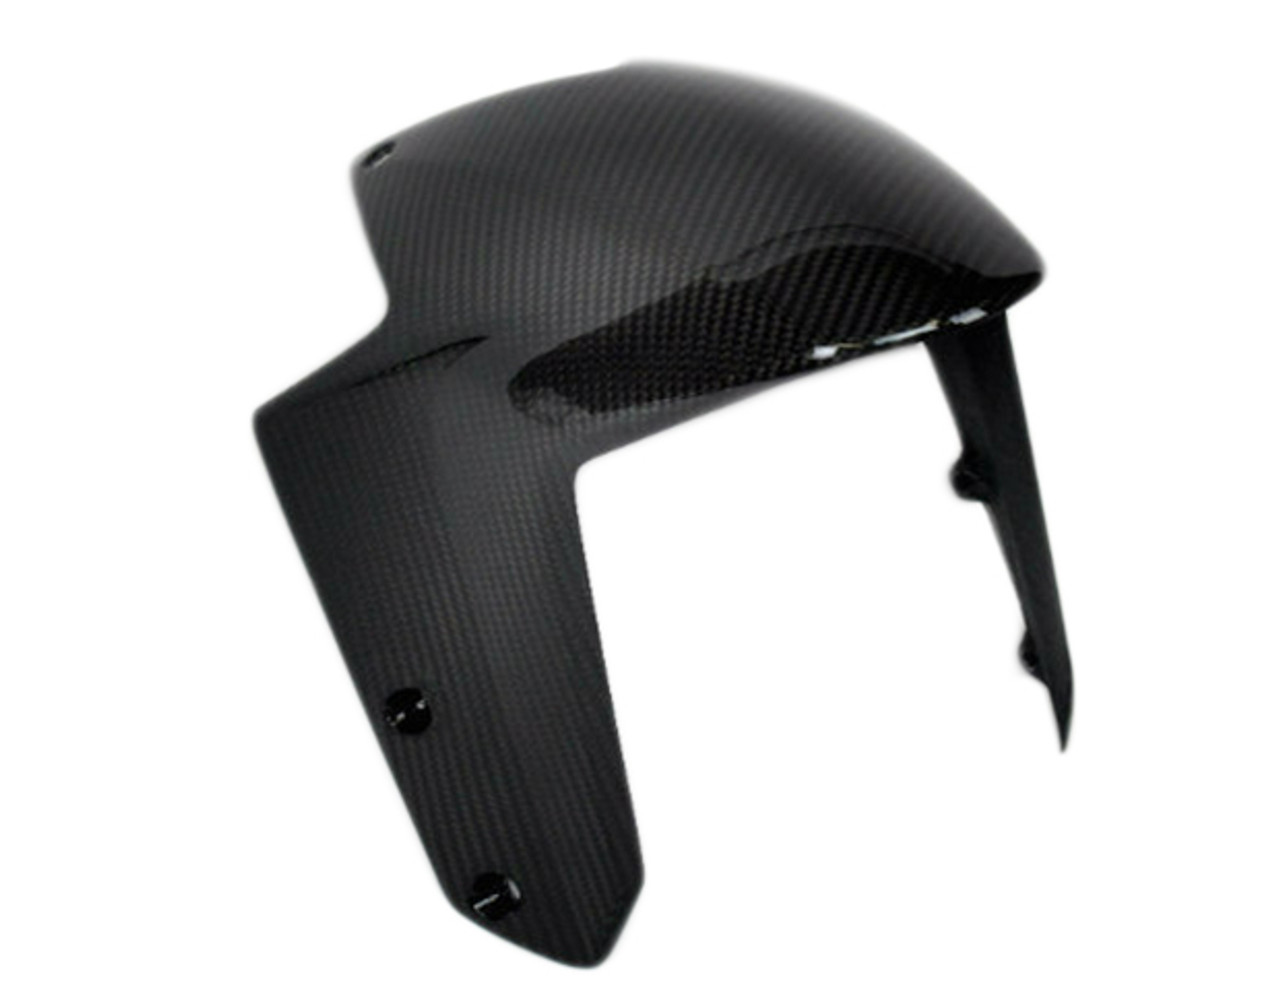 Front Fender (front part) in Glossy Twill Weave Carbon Fiber for KTM 1290 Super Duke R